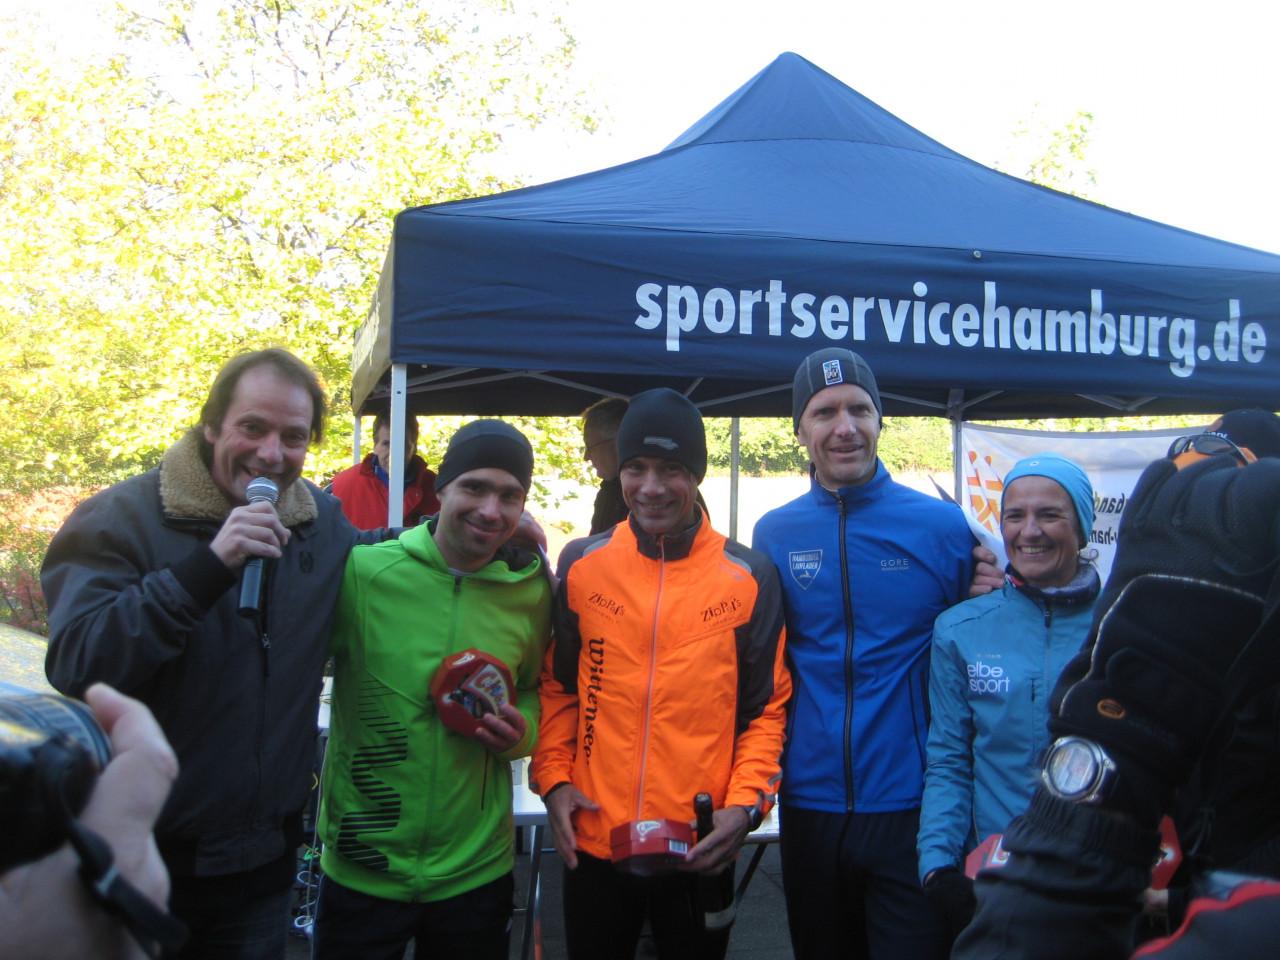 16.10.2011 Bramfelder Halbmarathon